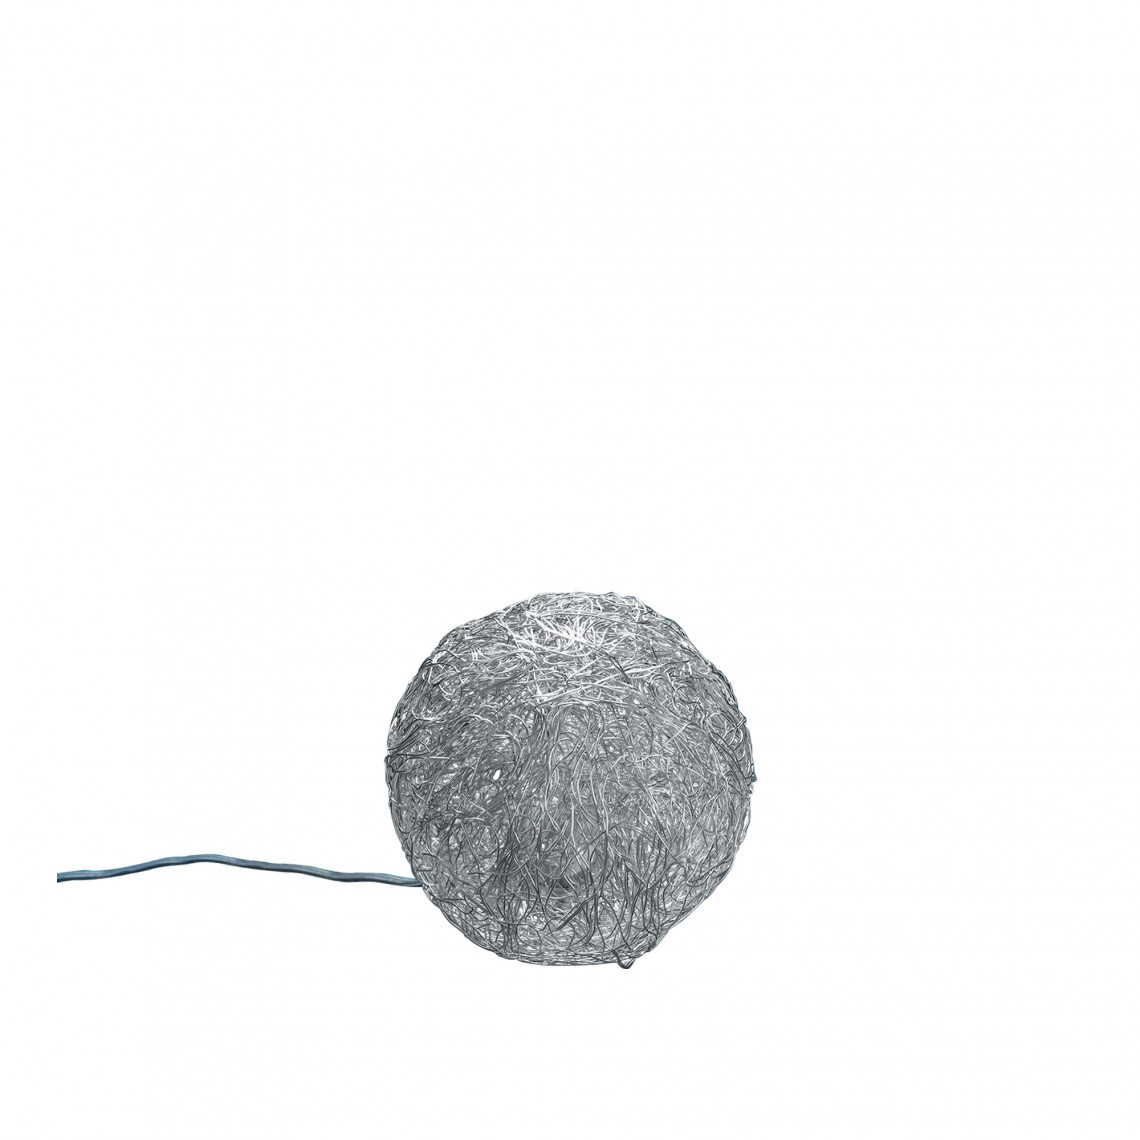 Sweet Light - Bordslampa Silverfärgad aluminium